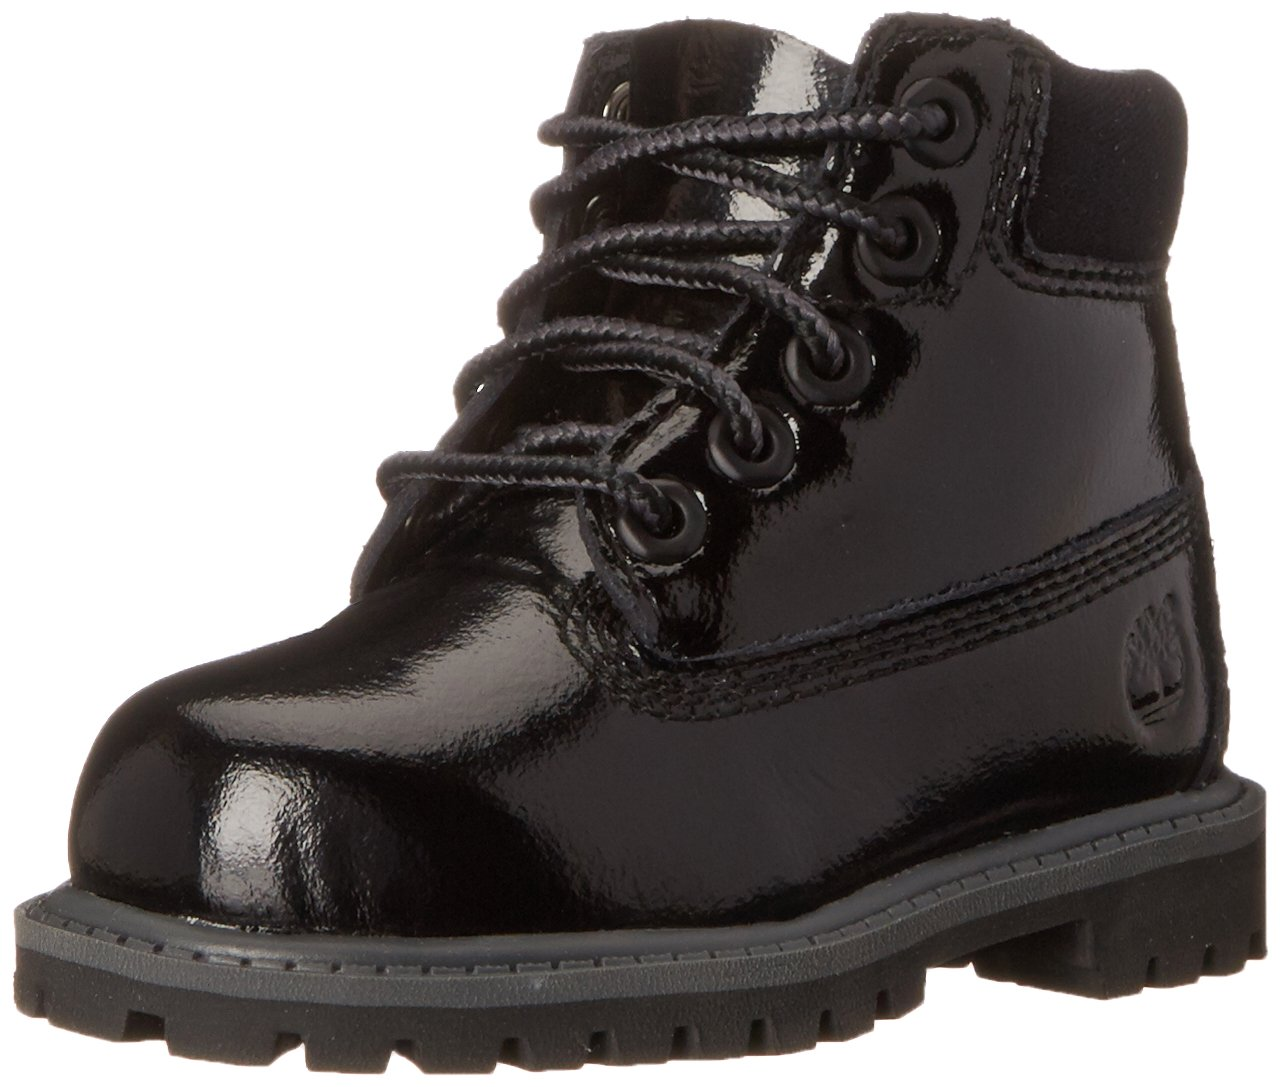 Timberland - Premium (Black) Junior Boot Boot - Mixte Junior Noir (Black) 13c2683 - latesttechnology.space